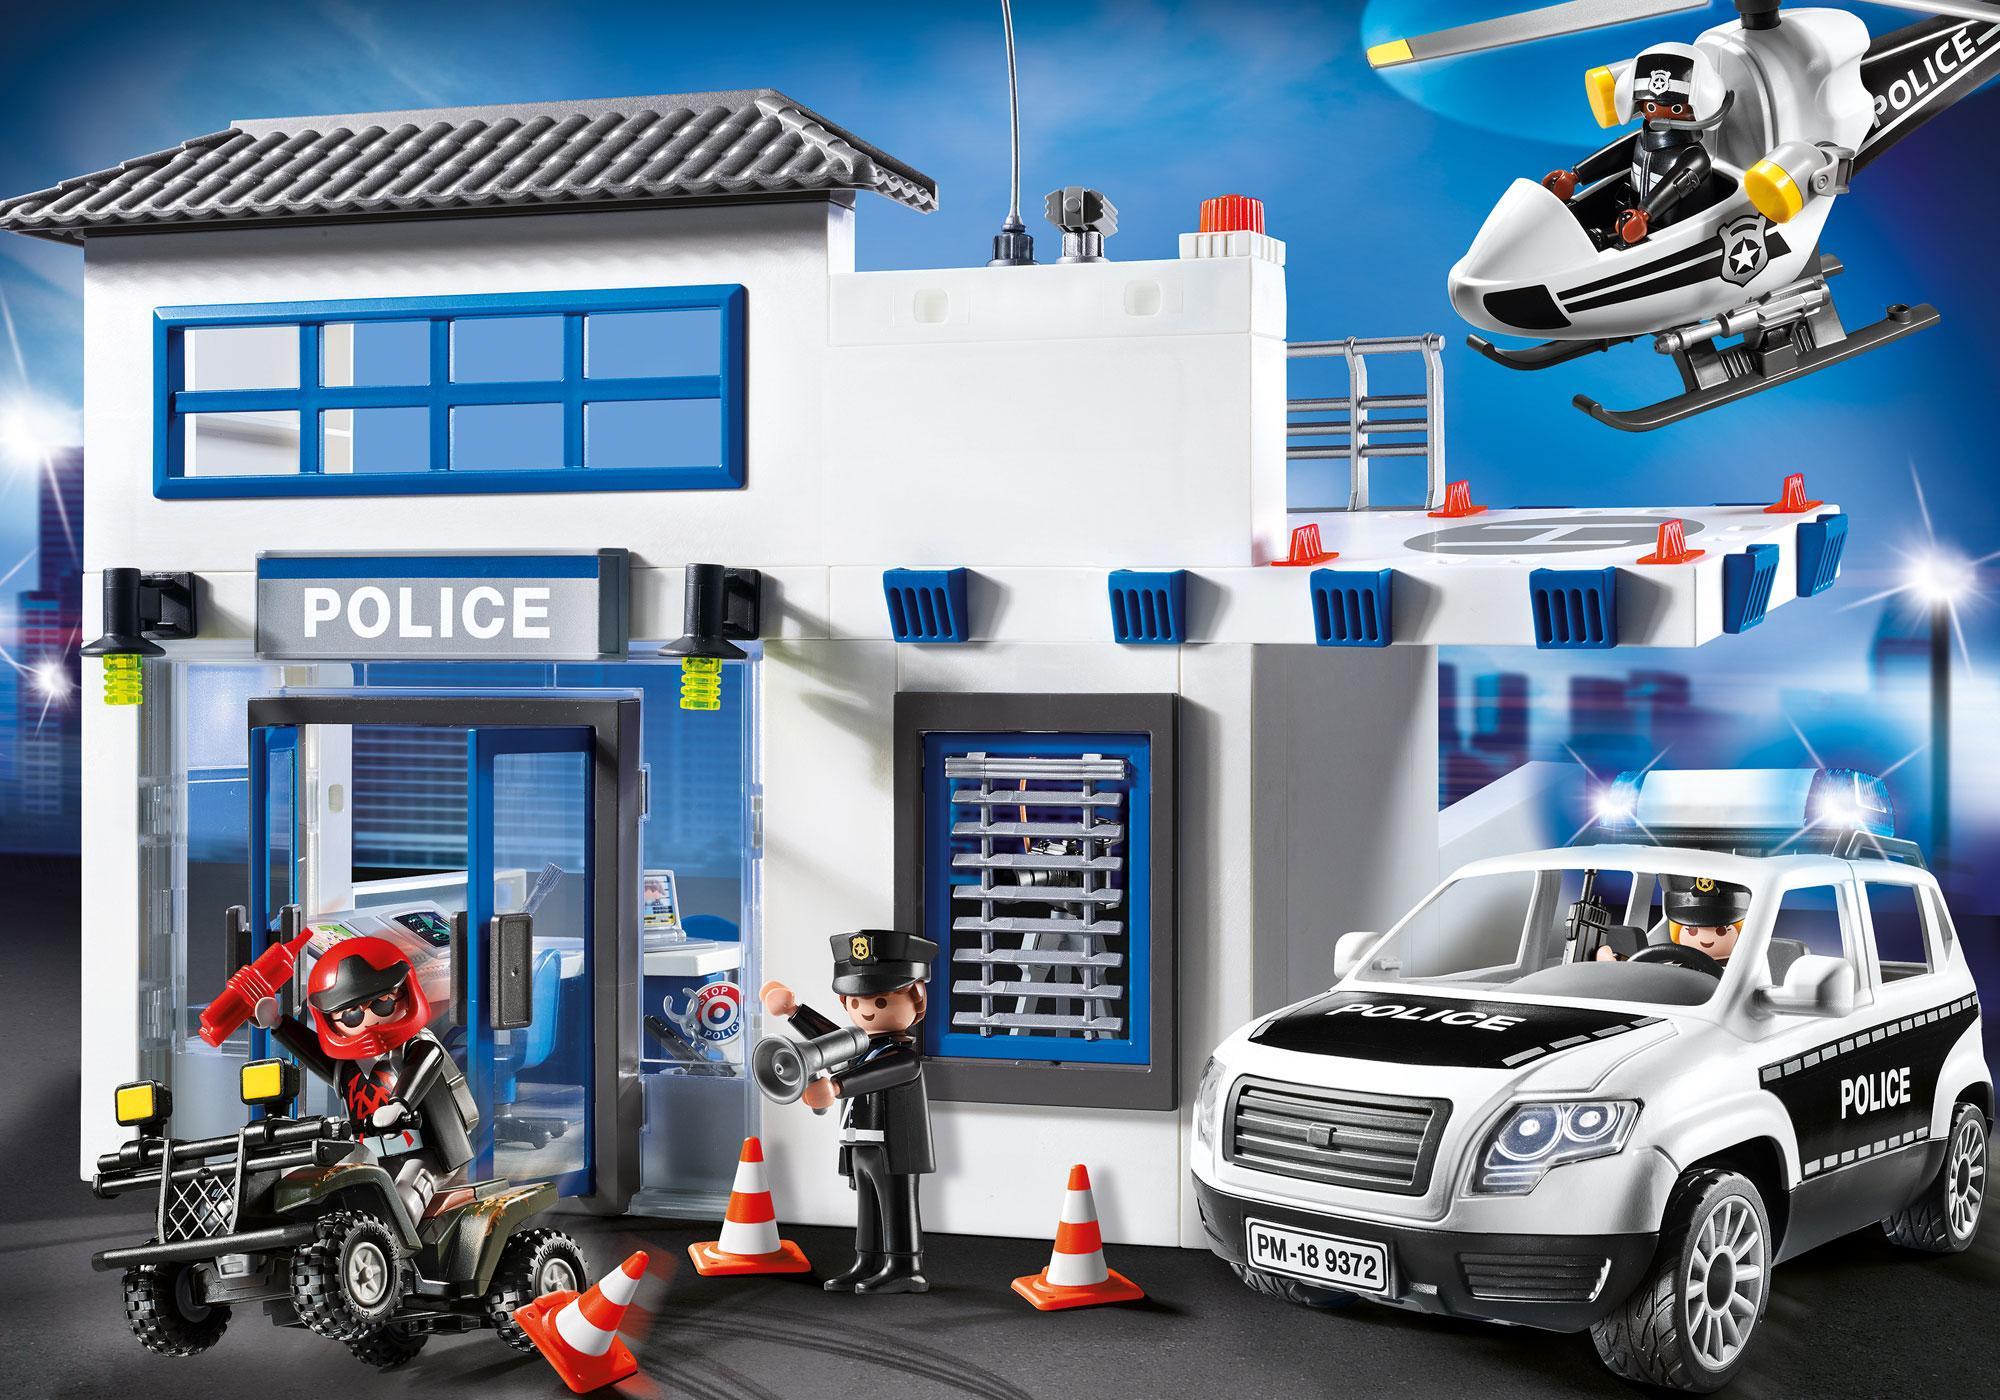 http://media.playmobil.com/i/playmobil/9372_product_detail/Polizeistation